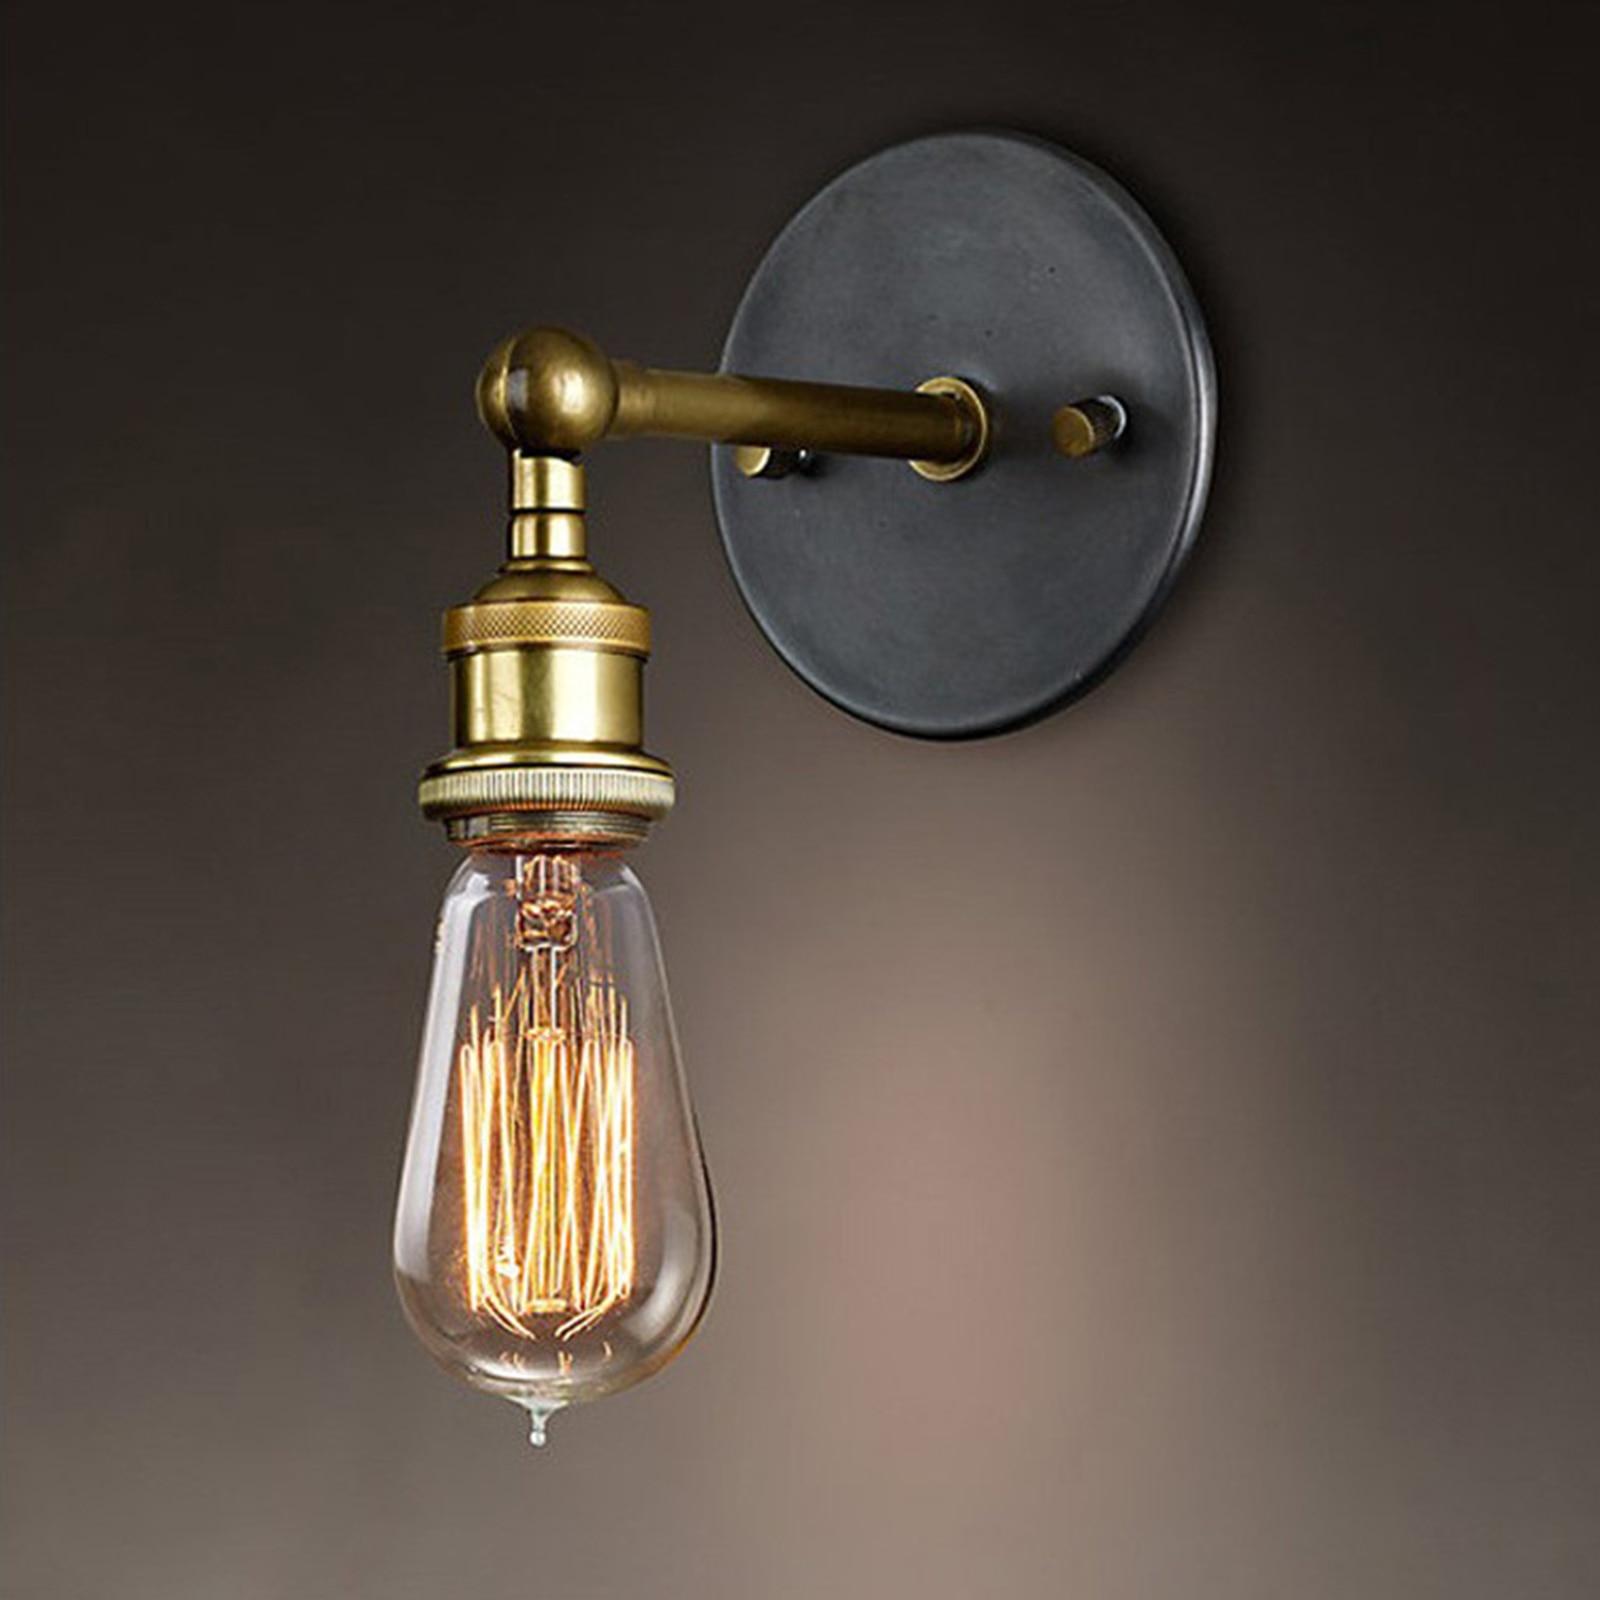 Metal Wall Light Sconce Lamp